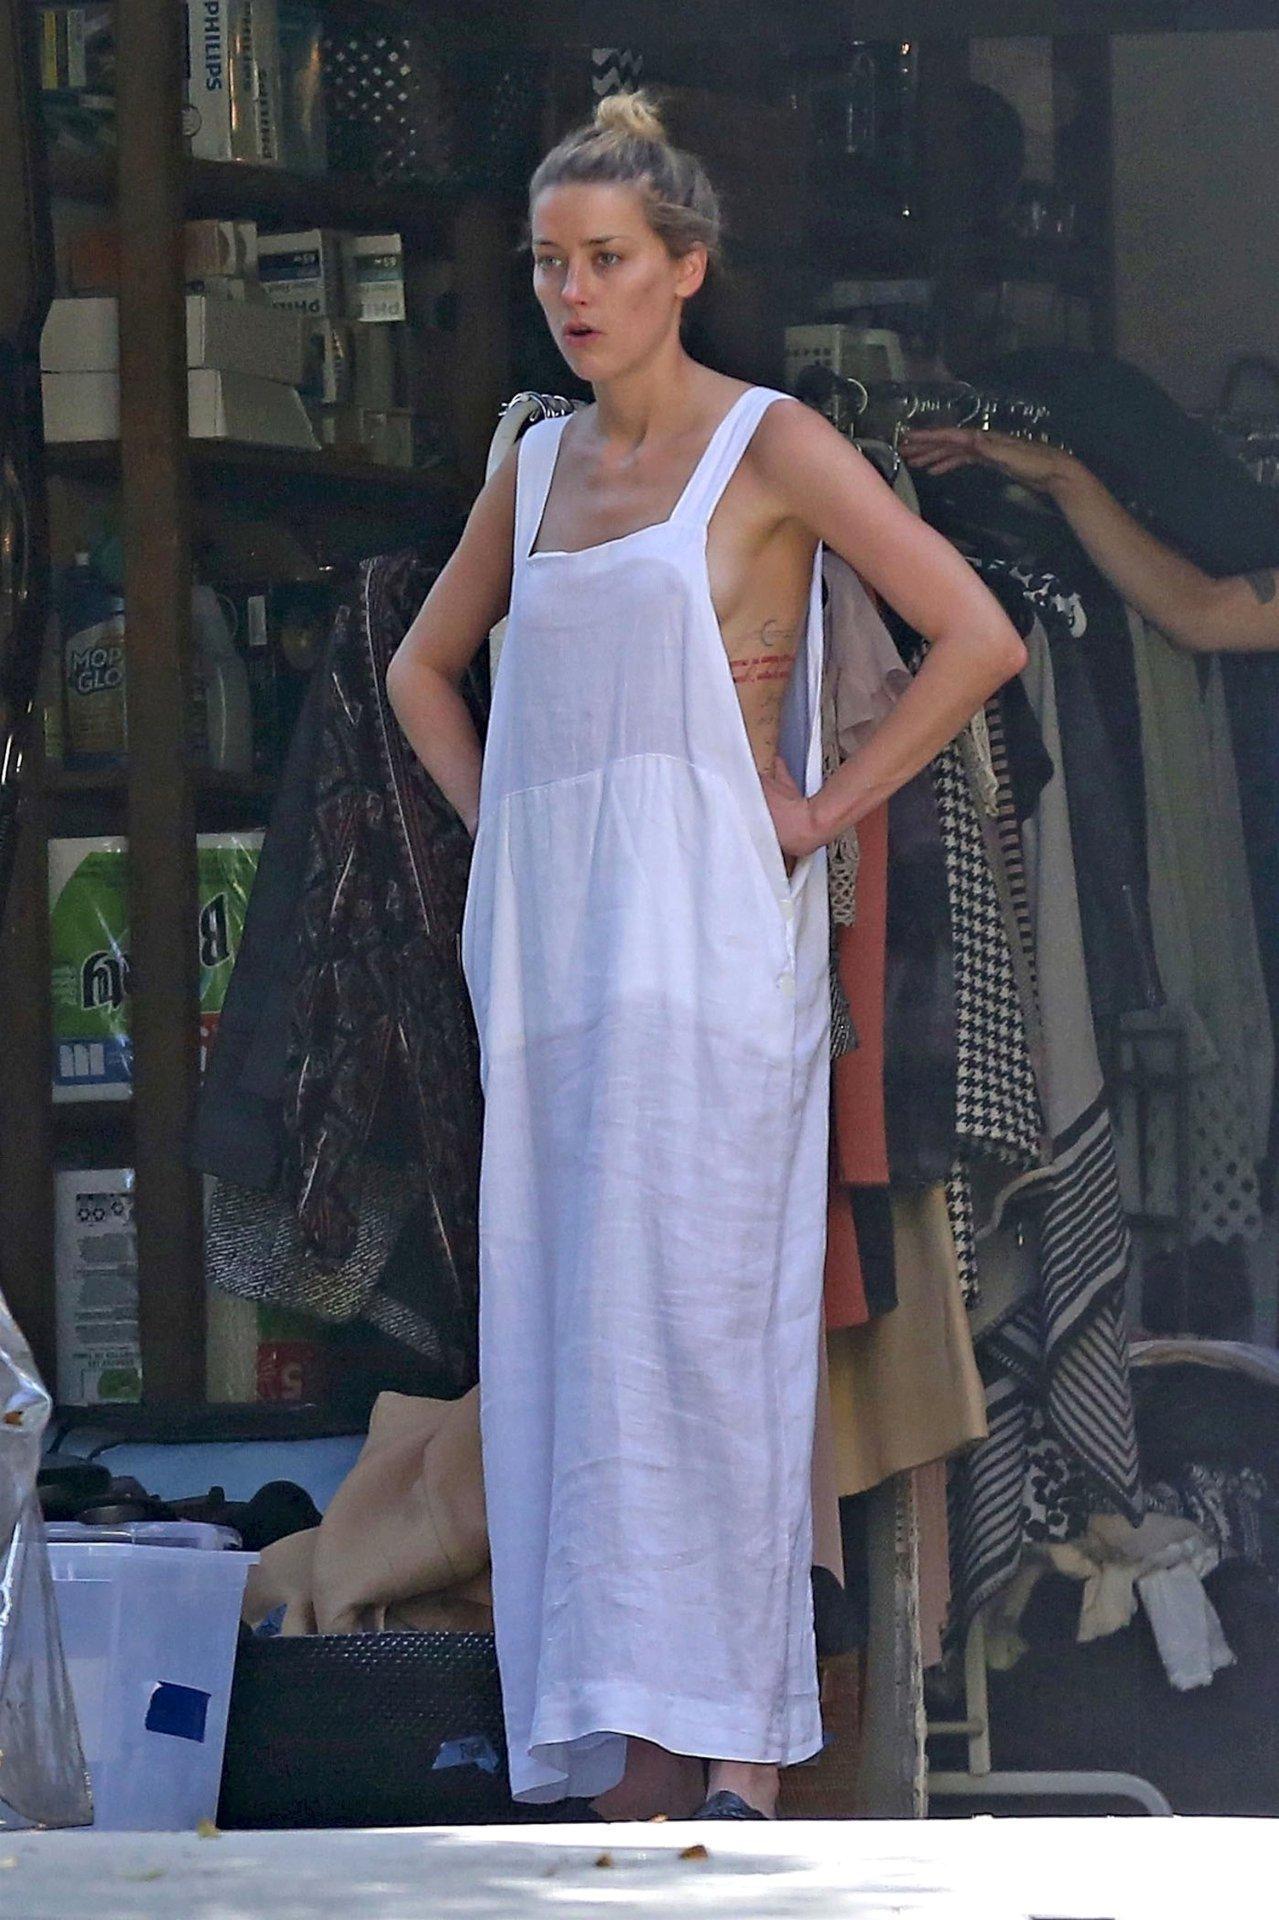 Amber Heard Topless Pics amber heard topless oops - hot celebs home